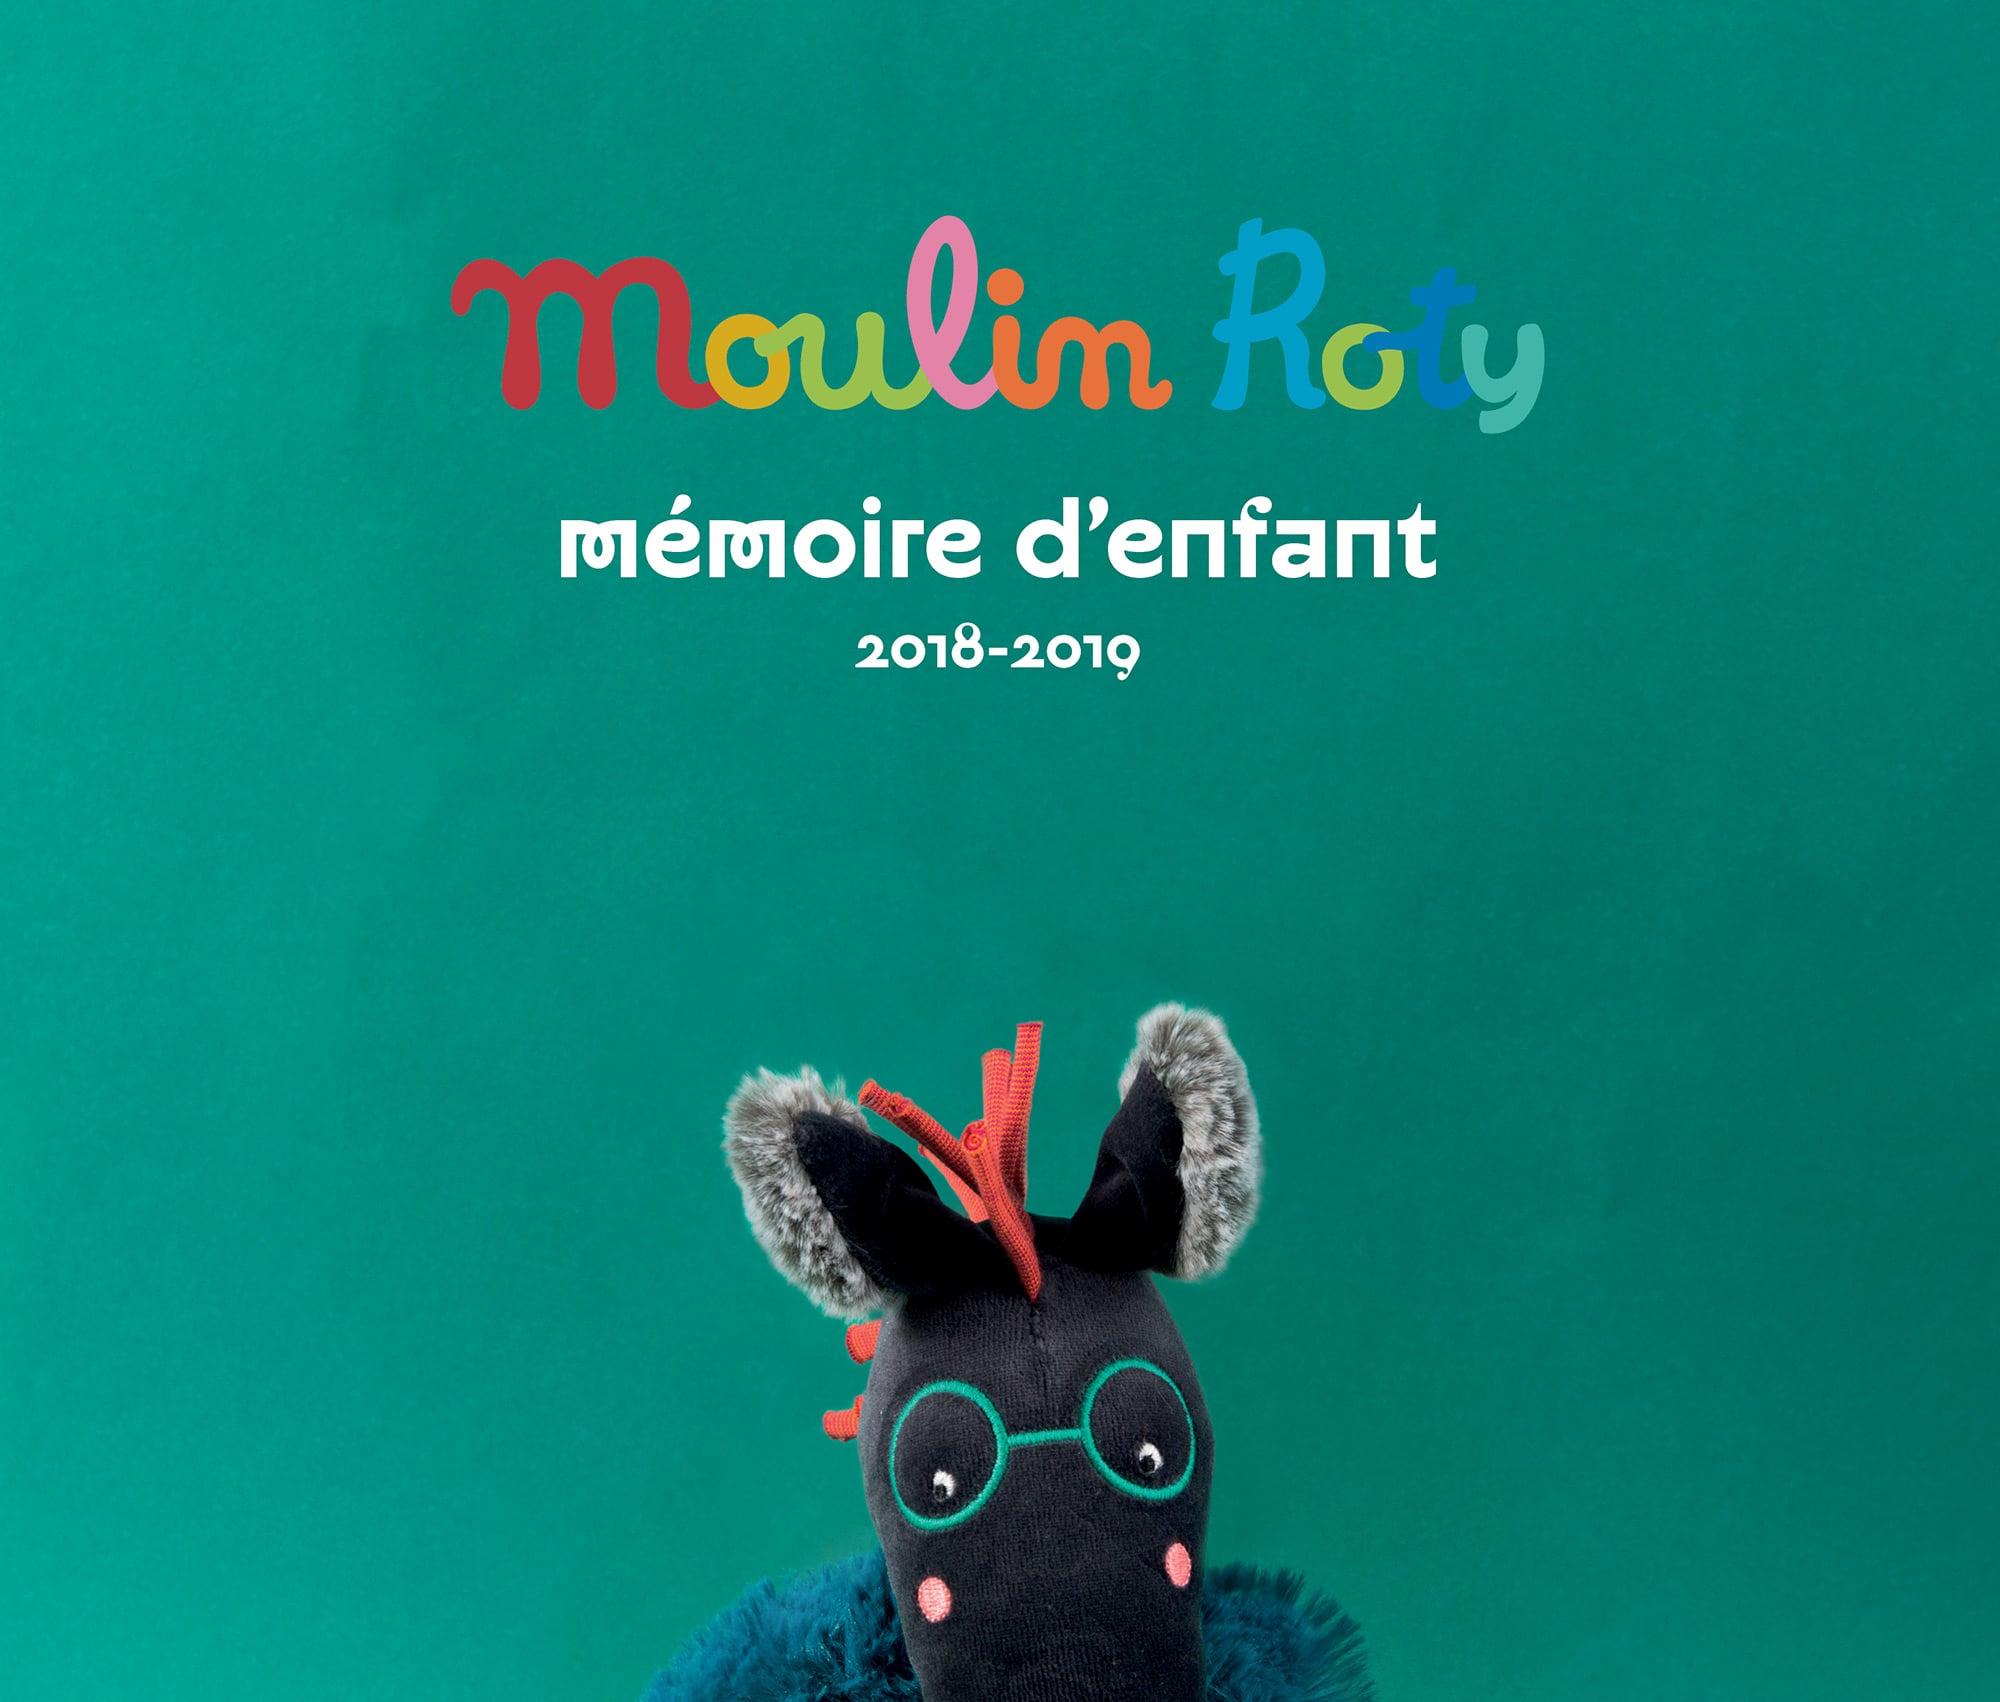 Memoire d'enfant - Moulin Roty 2018 - 2019